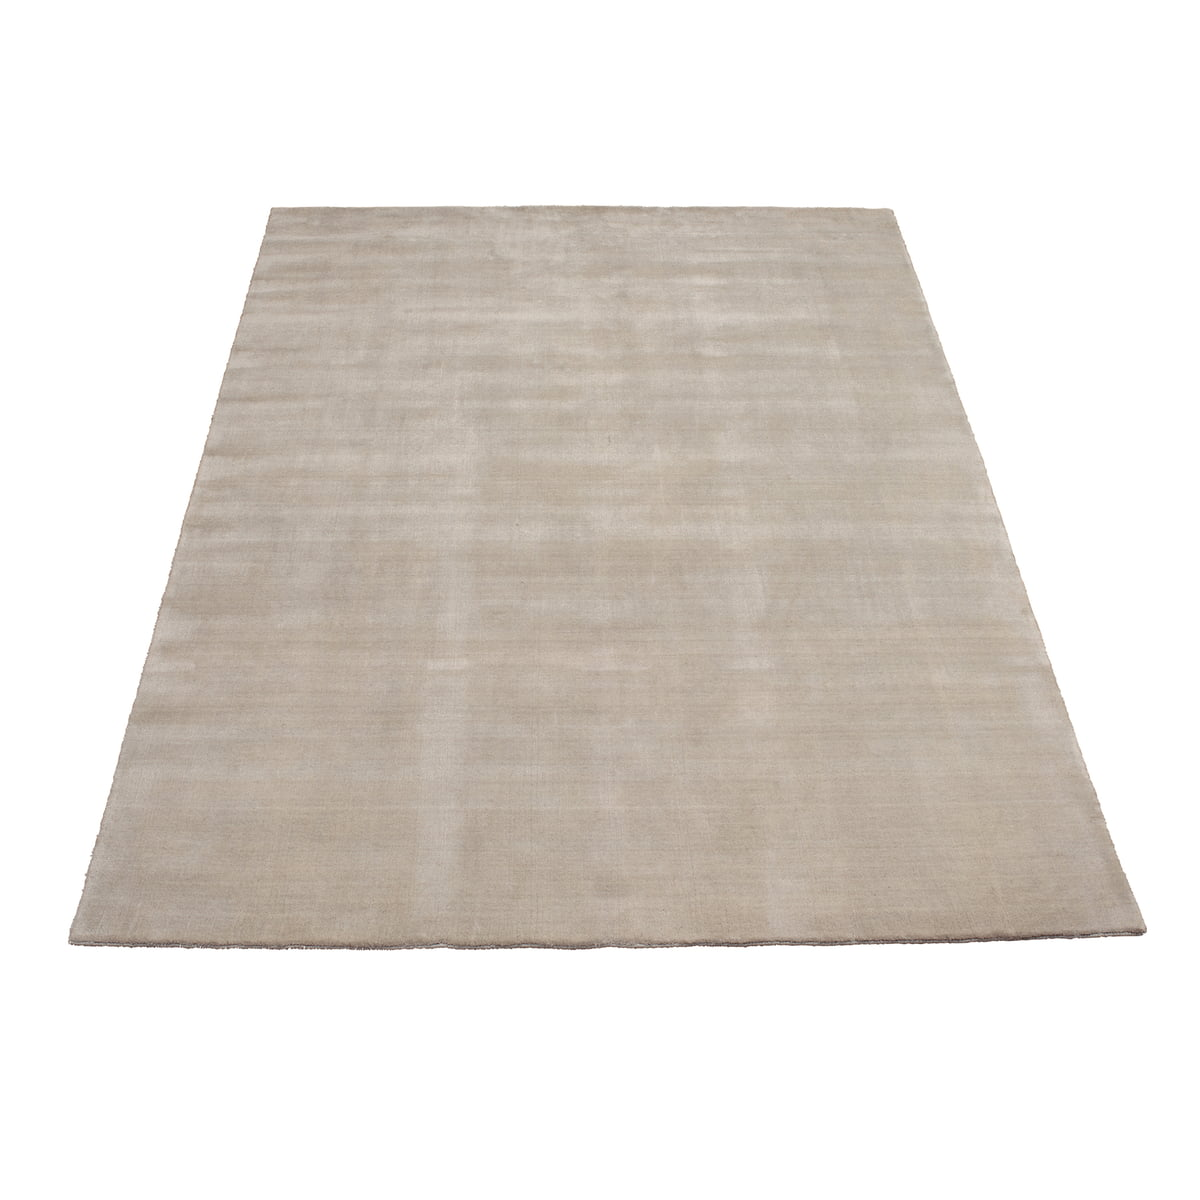 earth bamboo teppich von massimo connox. Black Bedroom Furniture Sets. Home Design Ideas